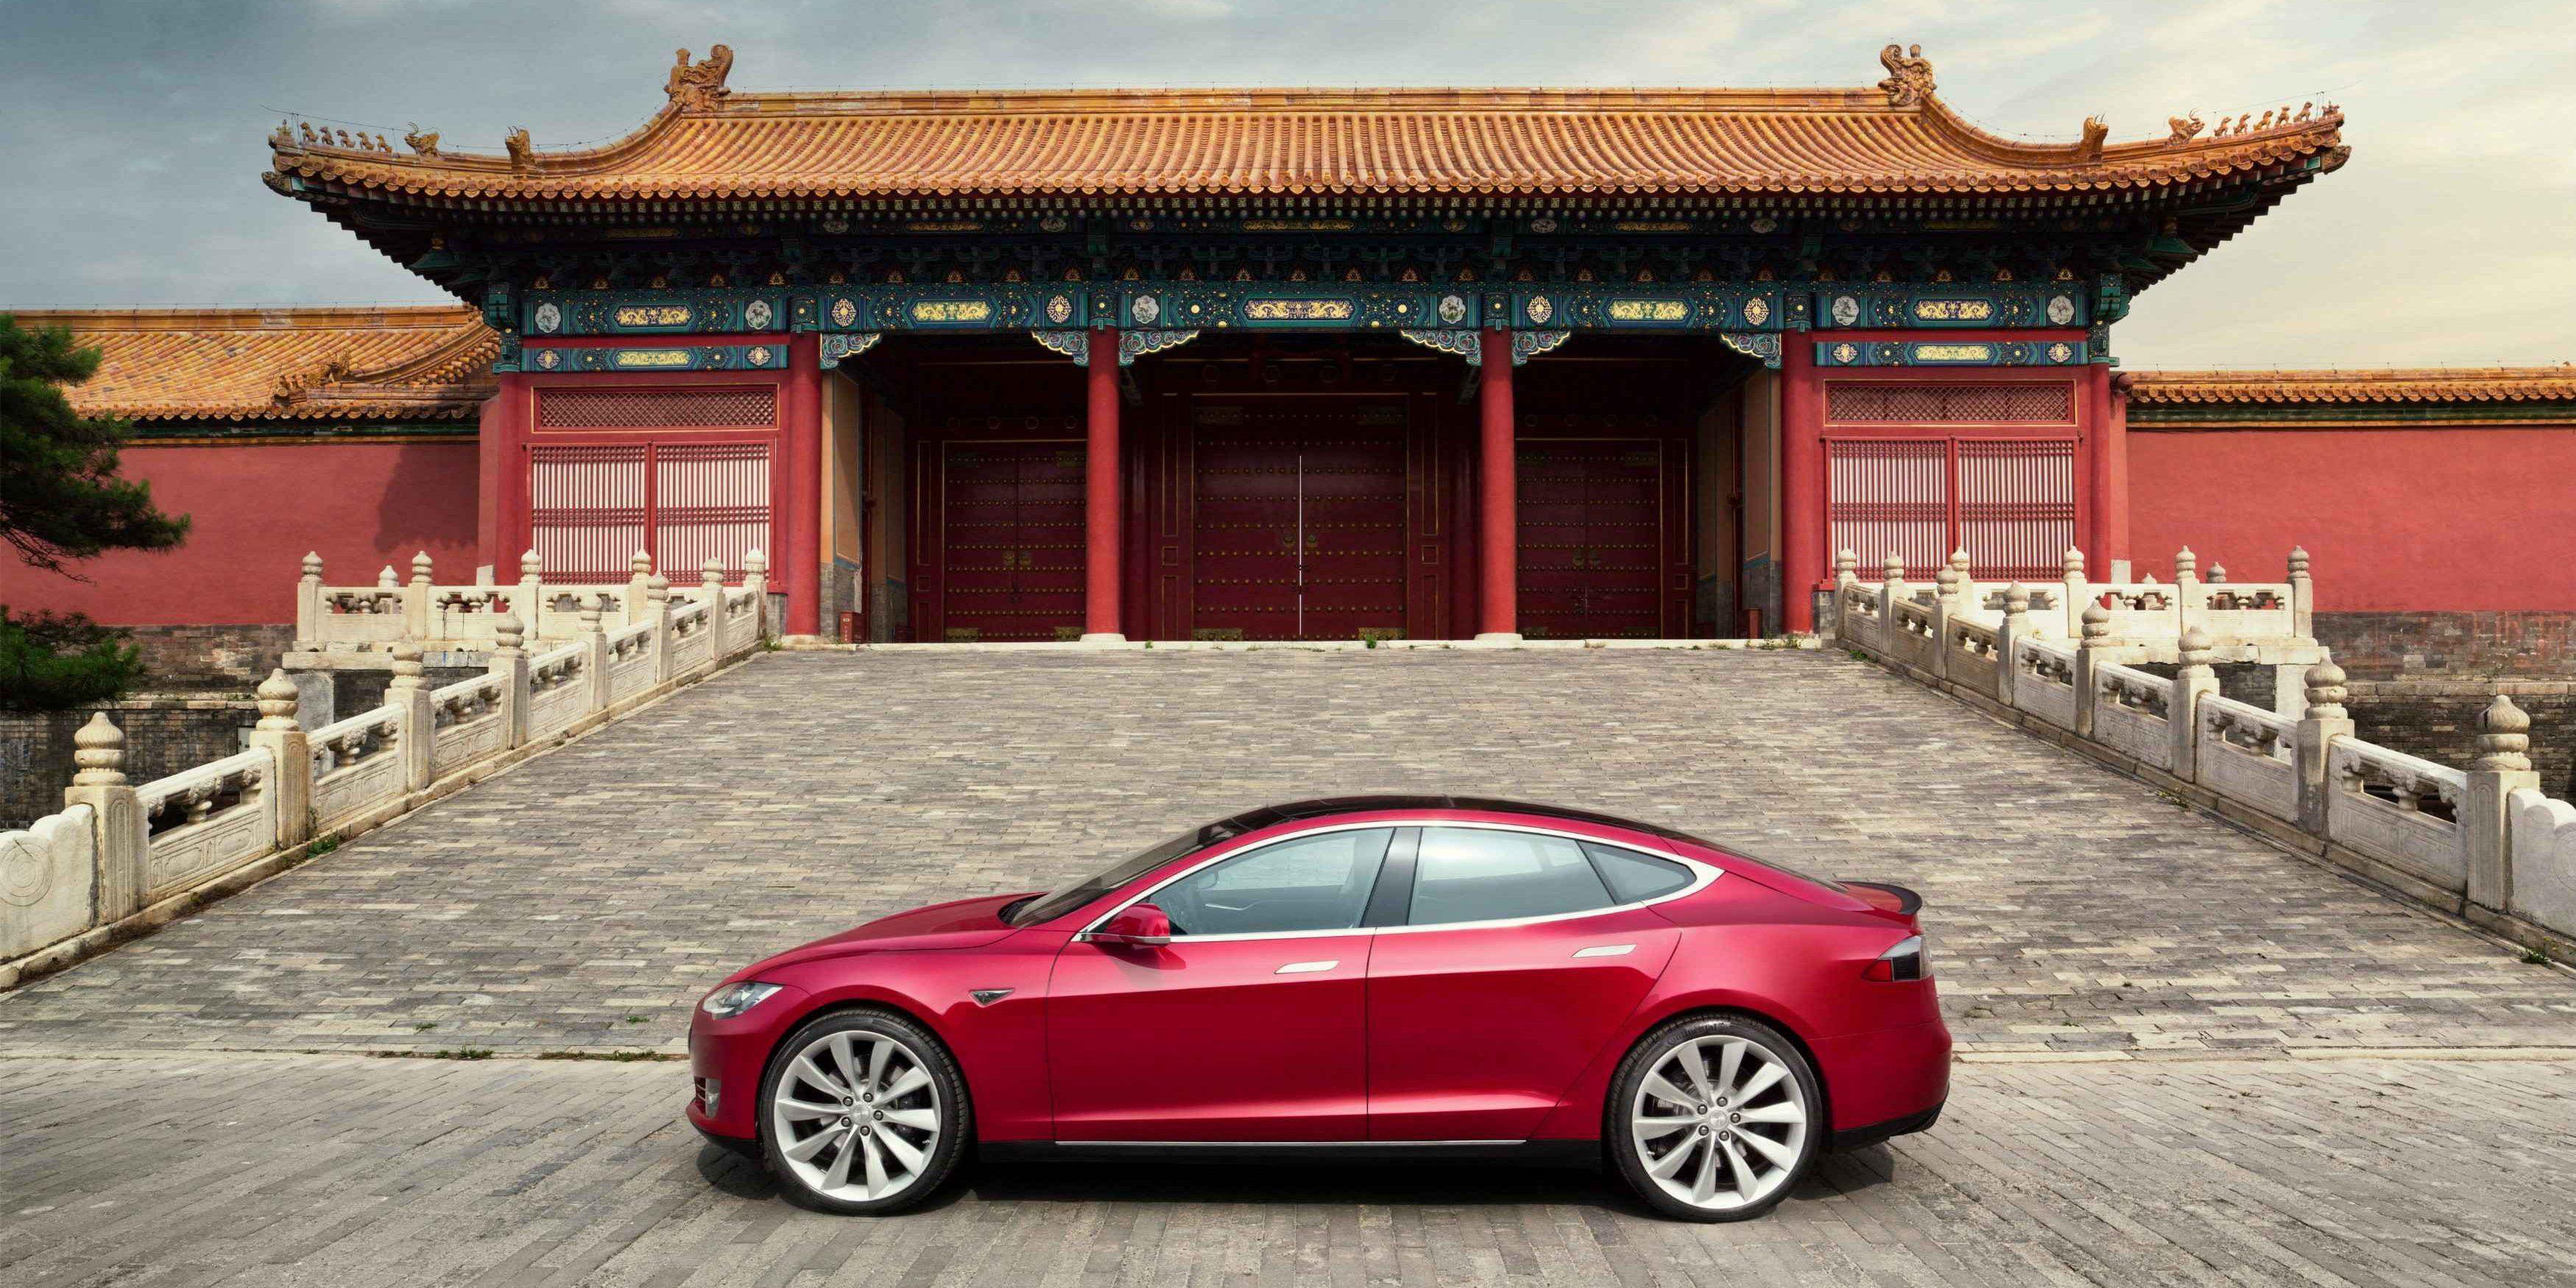 Tesla to build a gigafactory in Shanghai 7/10/2018